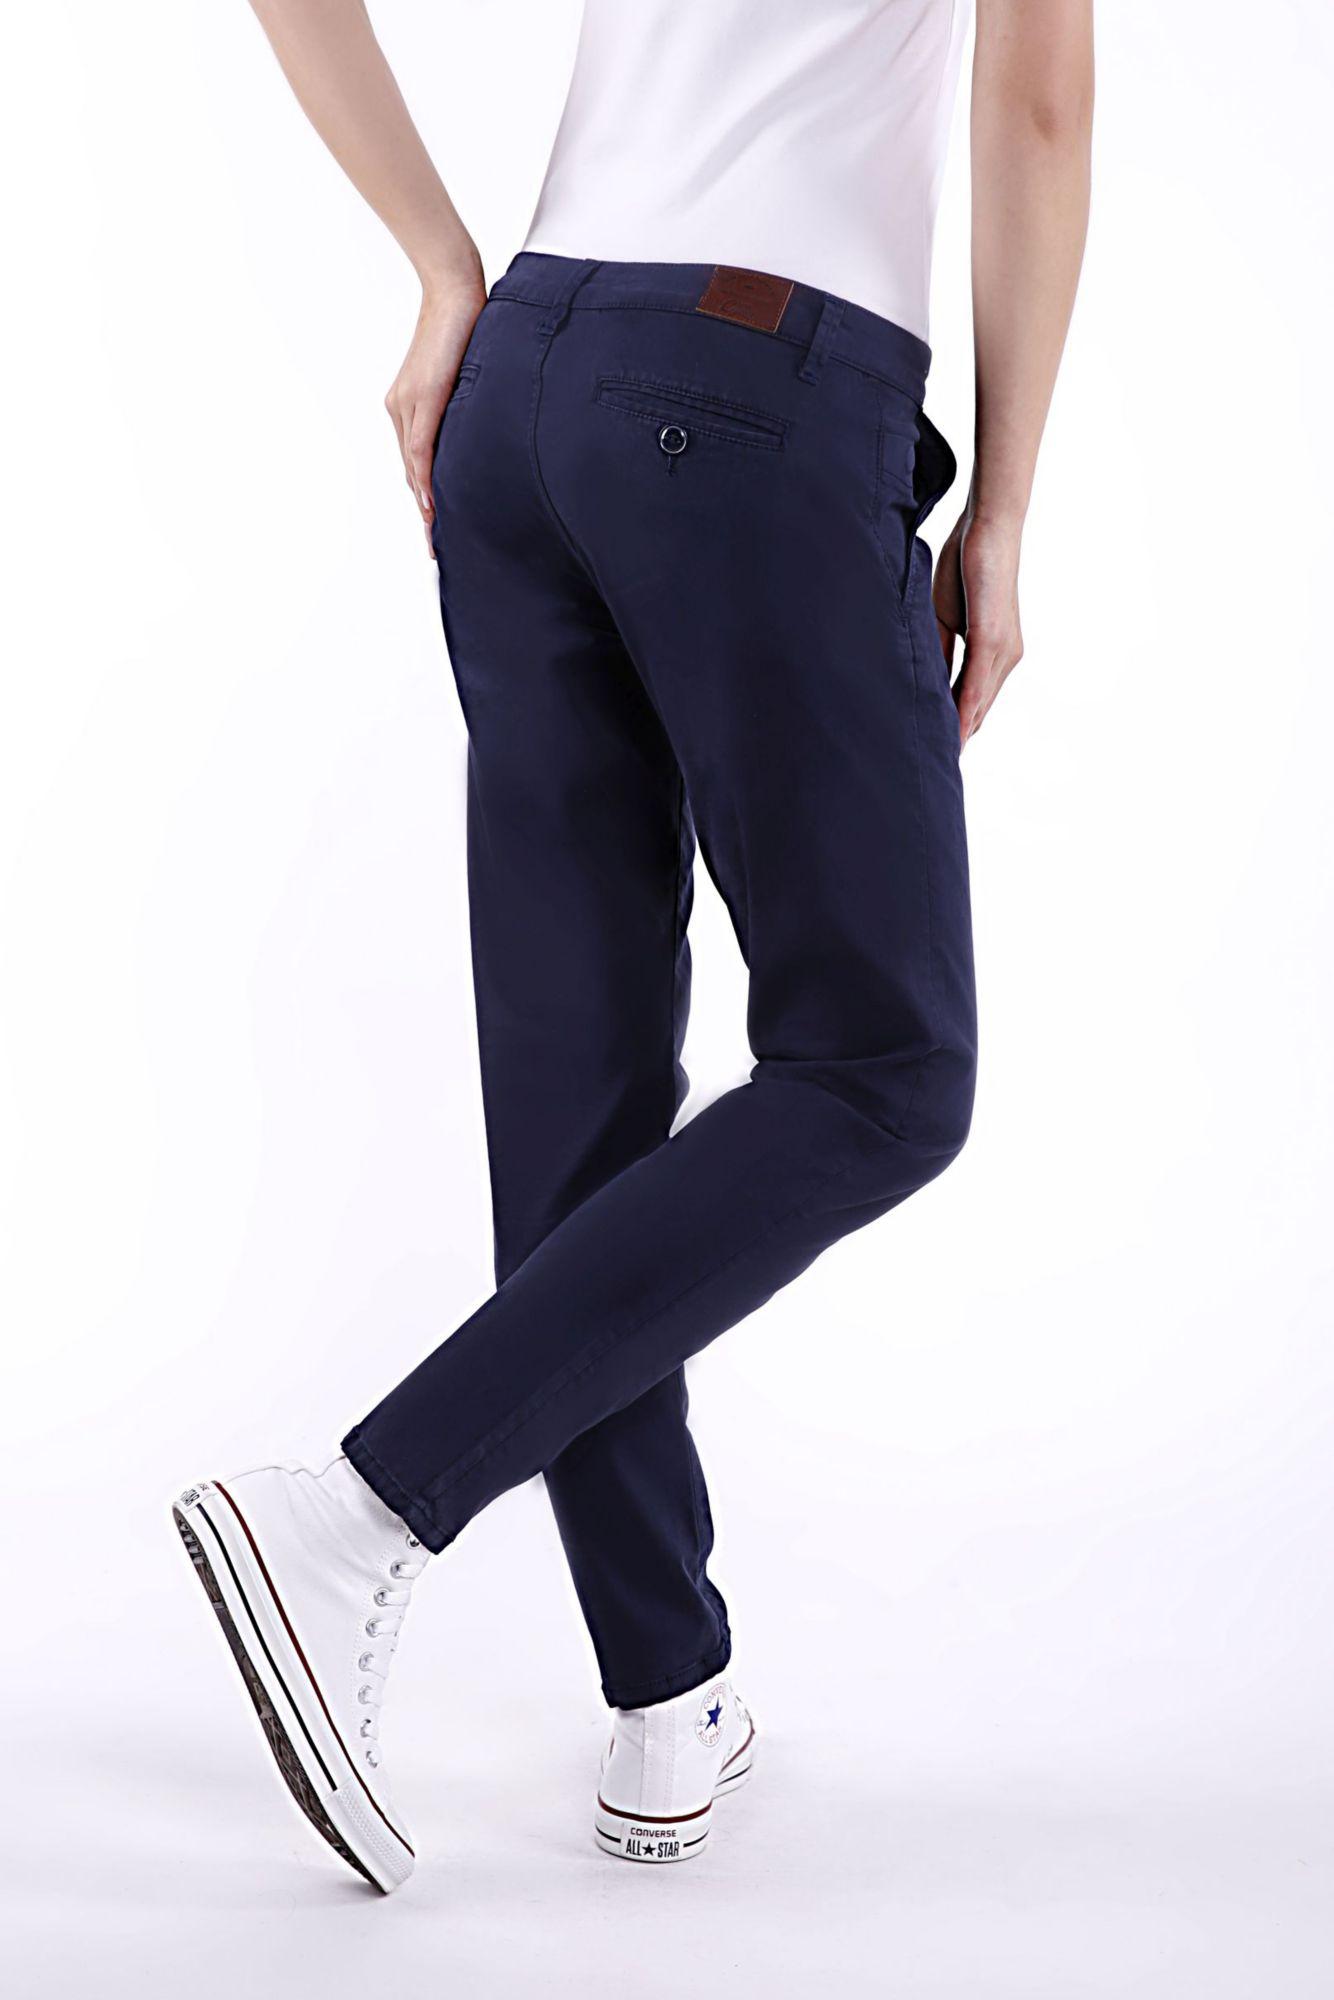 CROSS JEANS ® CROSS Jeans ® Regular Fit »Chino«